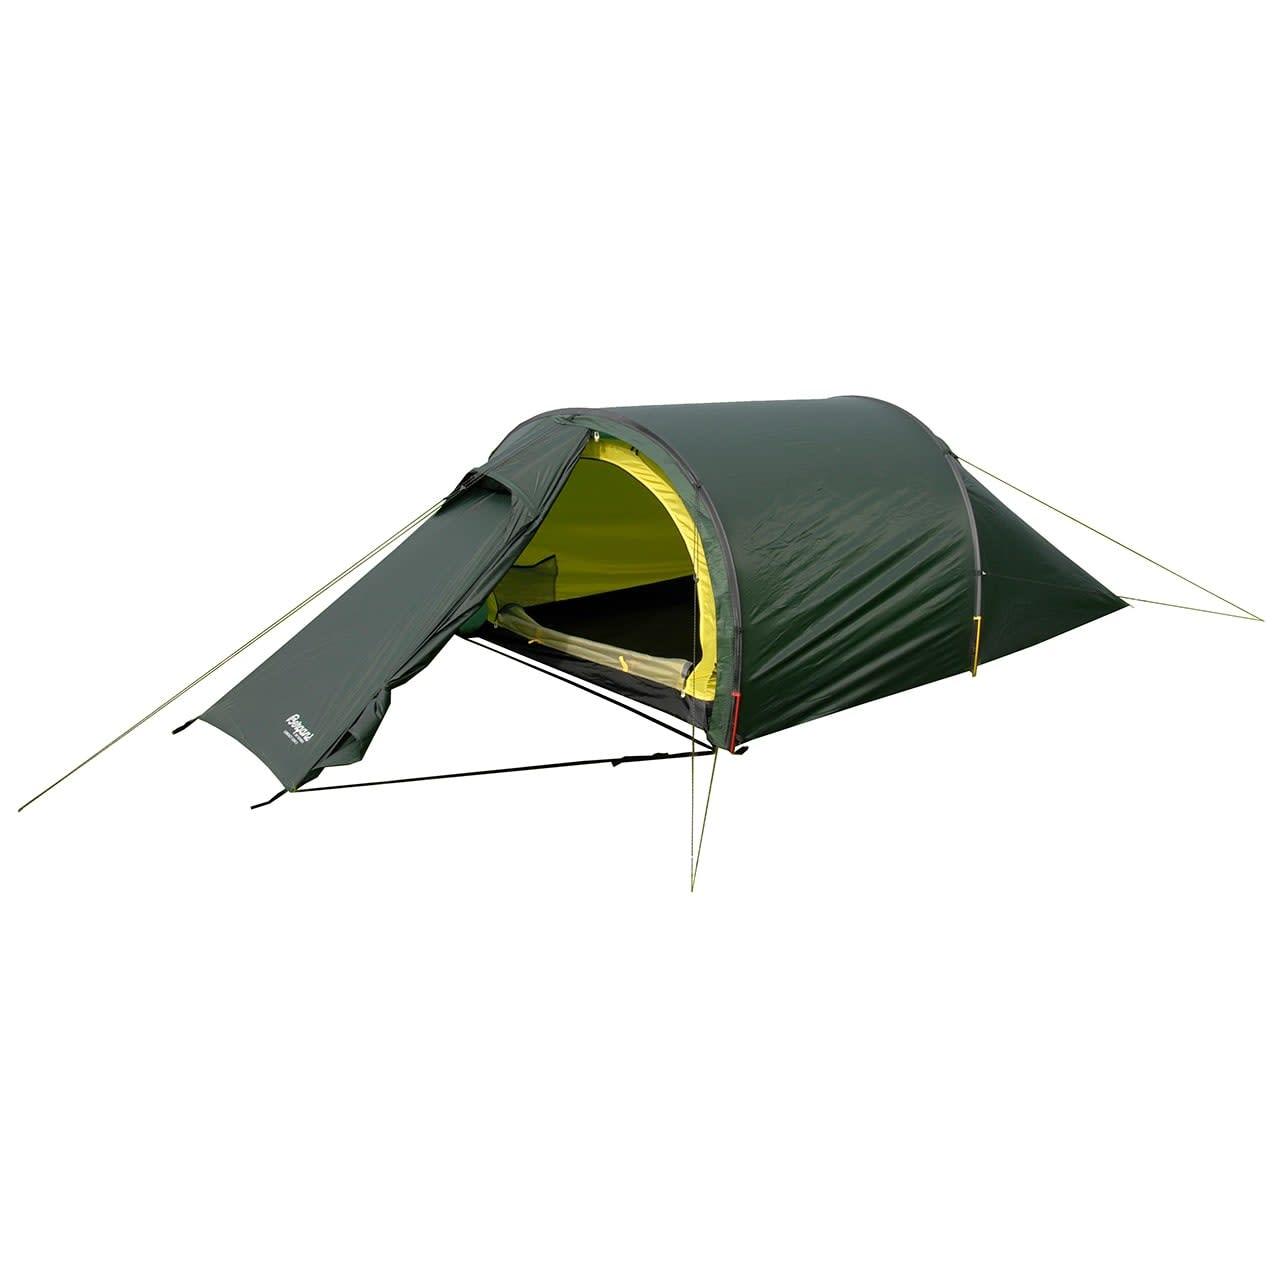 Hardangervidda 2-pers Tent - Bergans